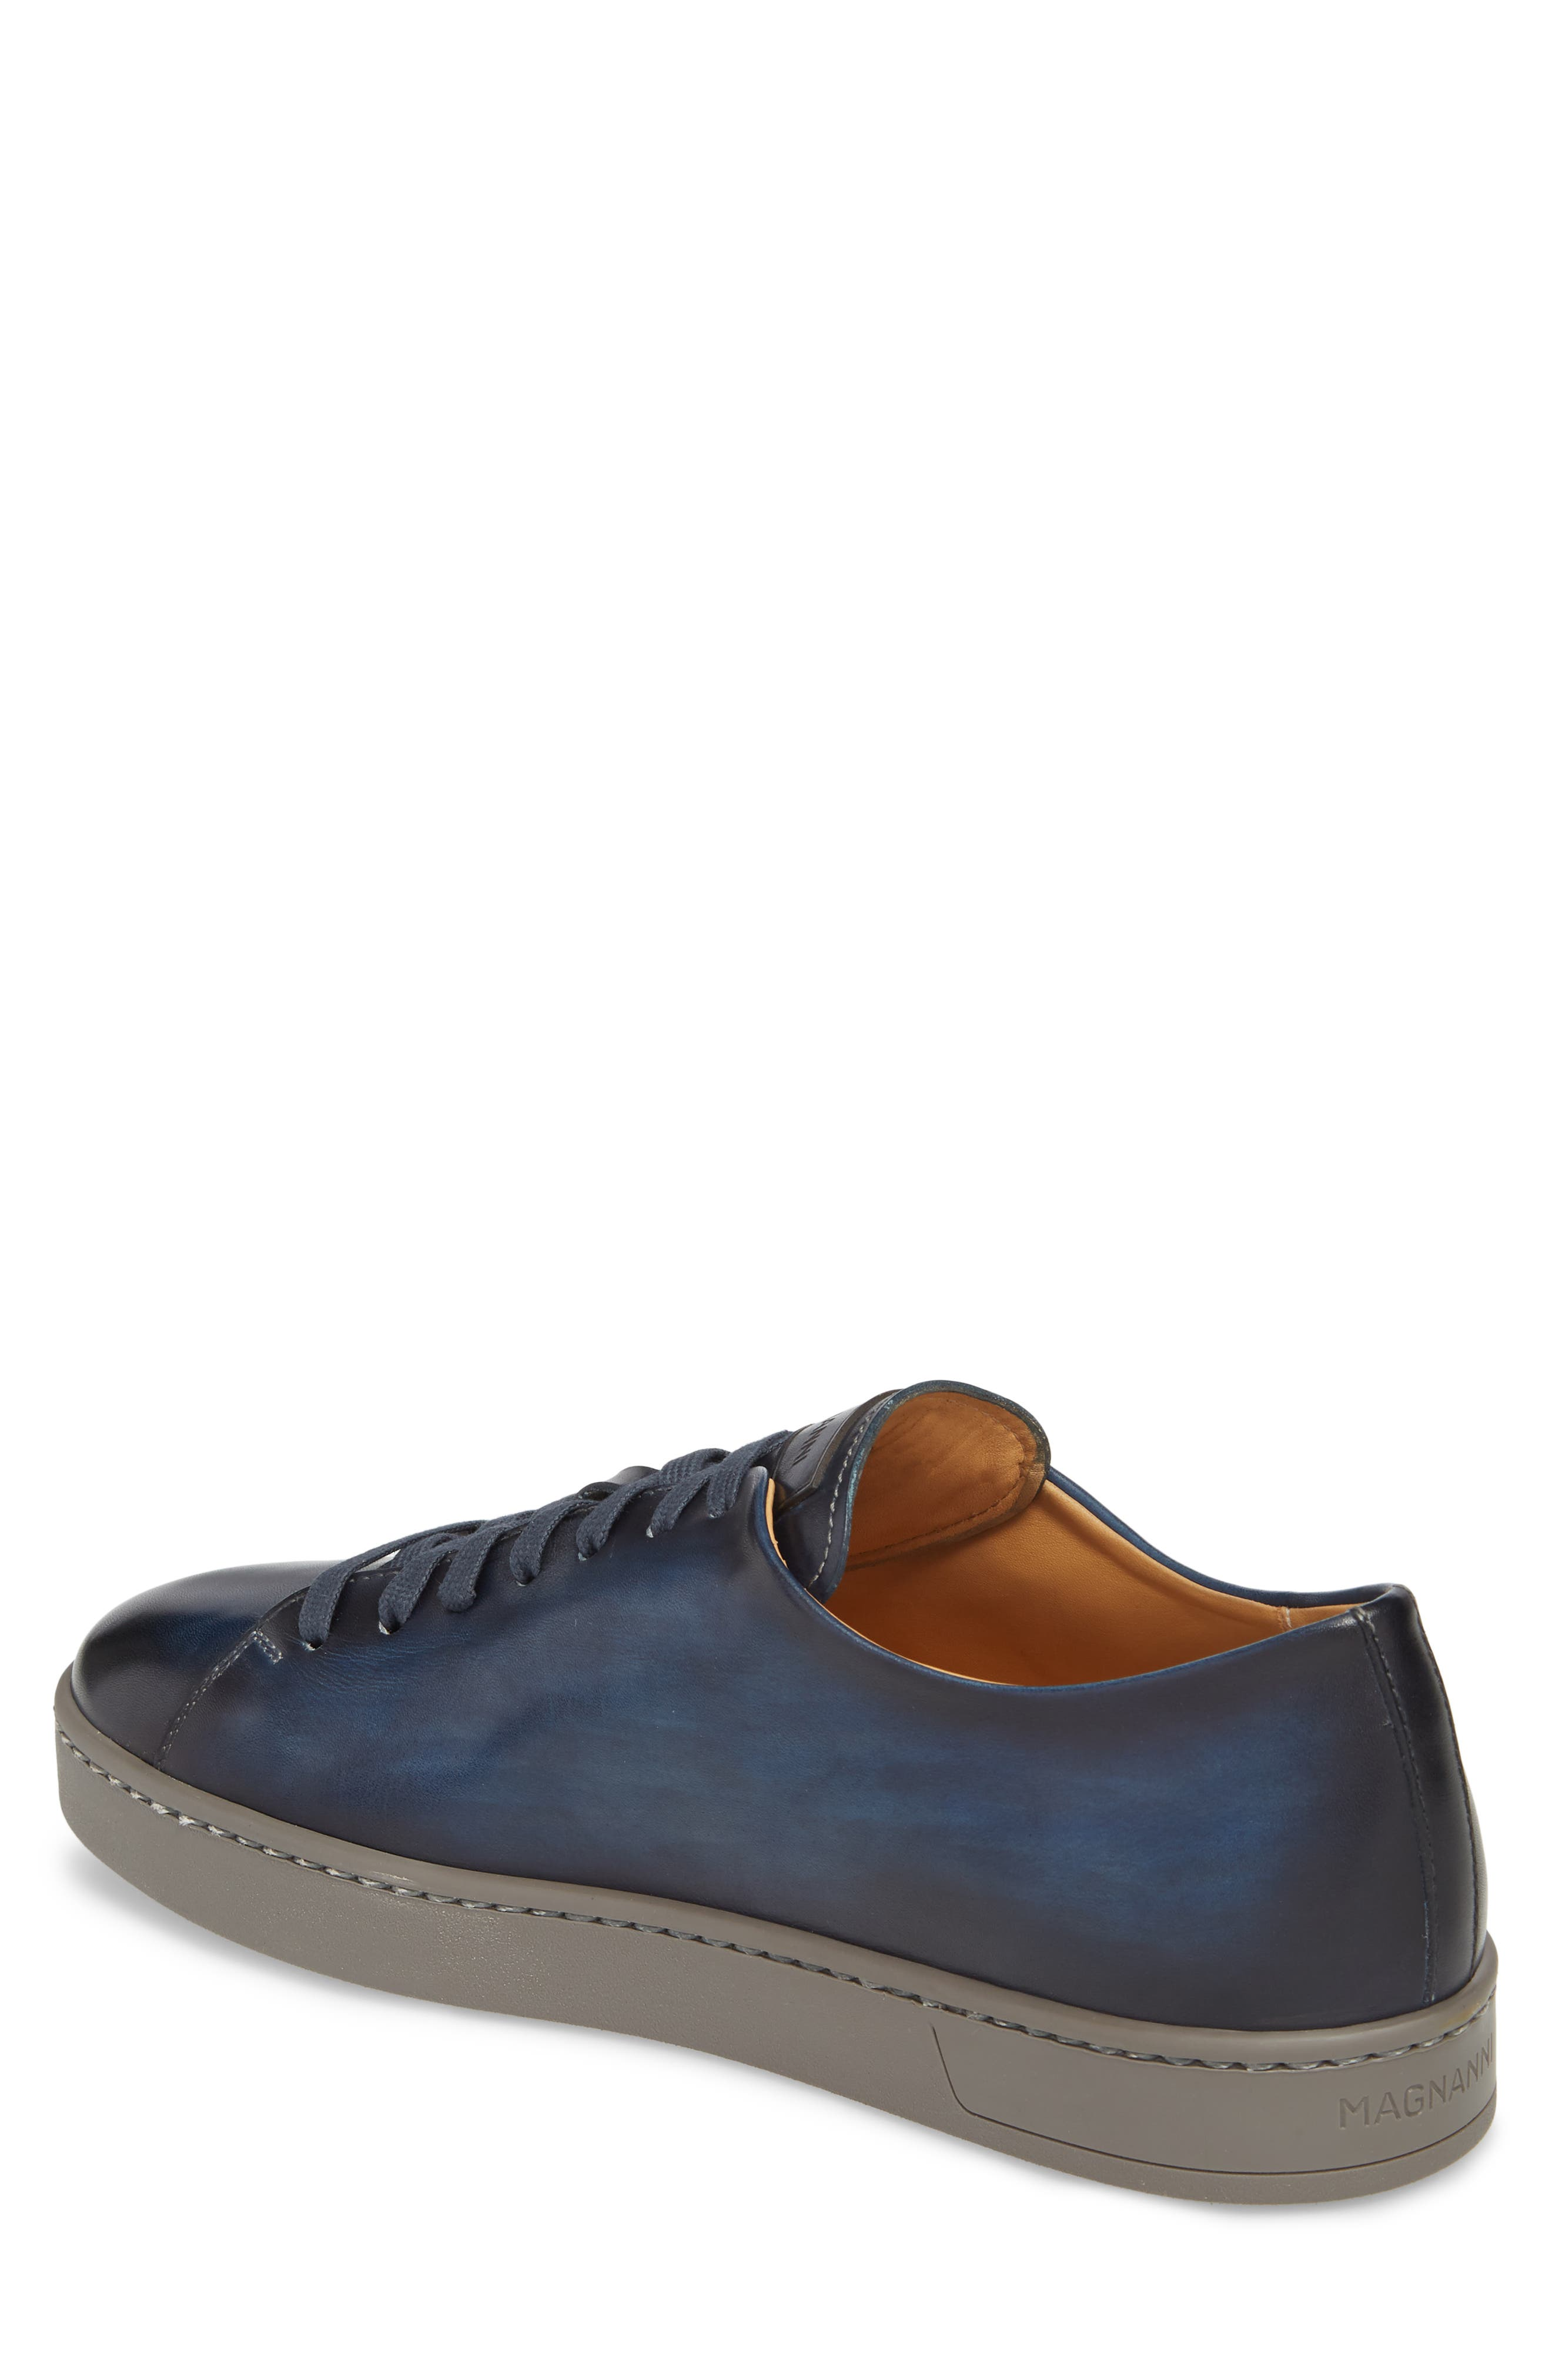 Belmont Lo Sneaker,                             Alternate thumbnail 2, color,                             NAVY LEATHER